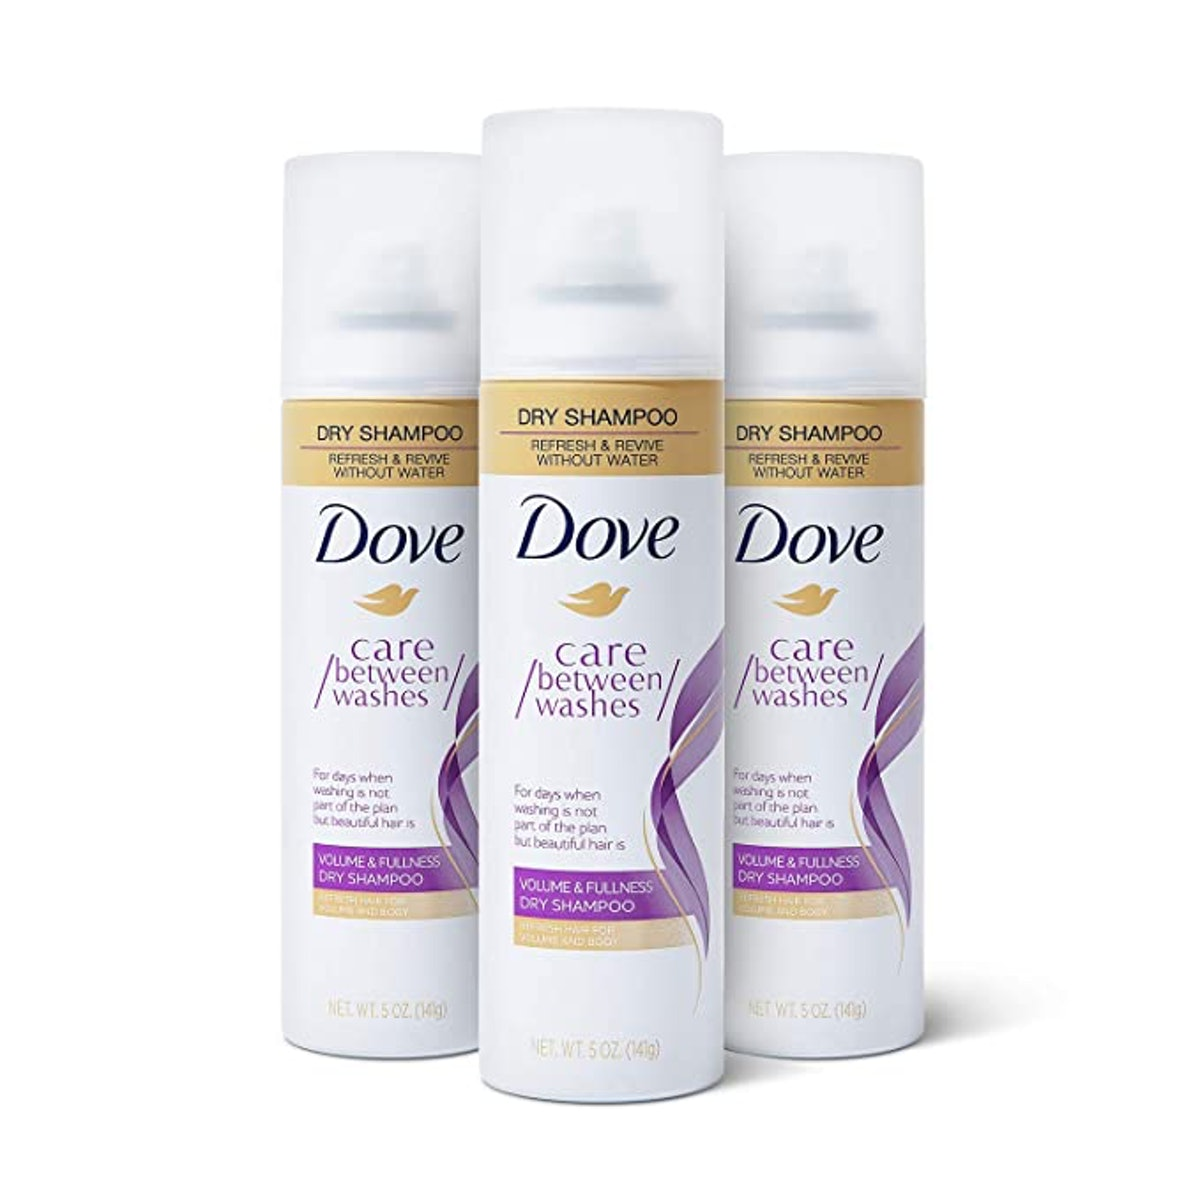 Dove Dry Shampoo Hair Treatment for Oily Hair (3-Pack)